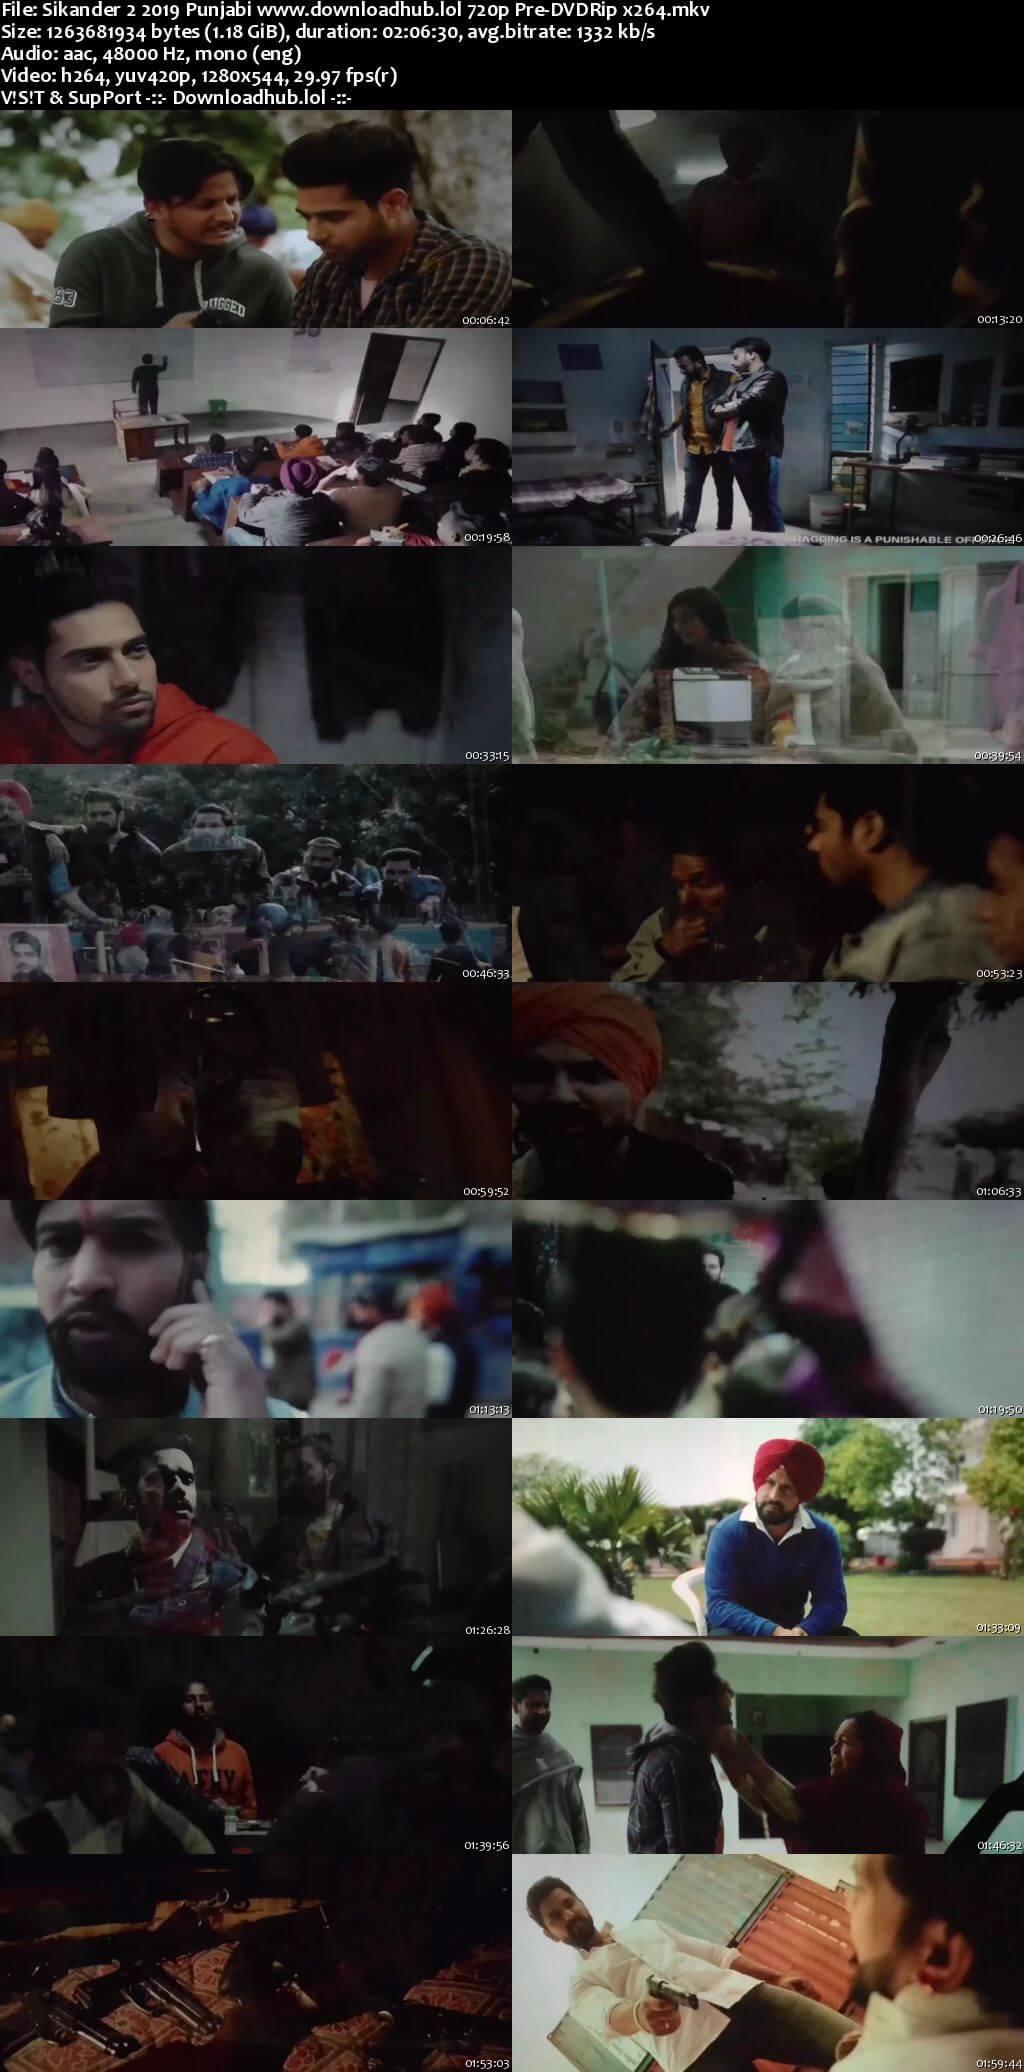 Sikander 2 2019 Punjabi 720p Pre-DVDRip x264